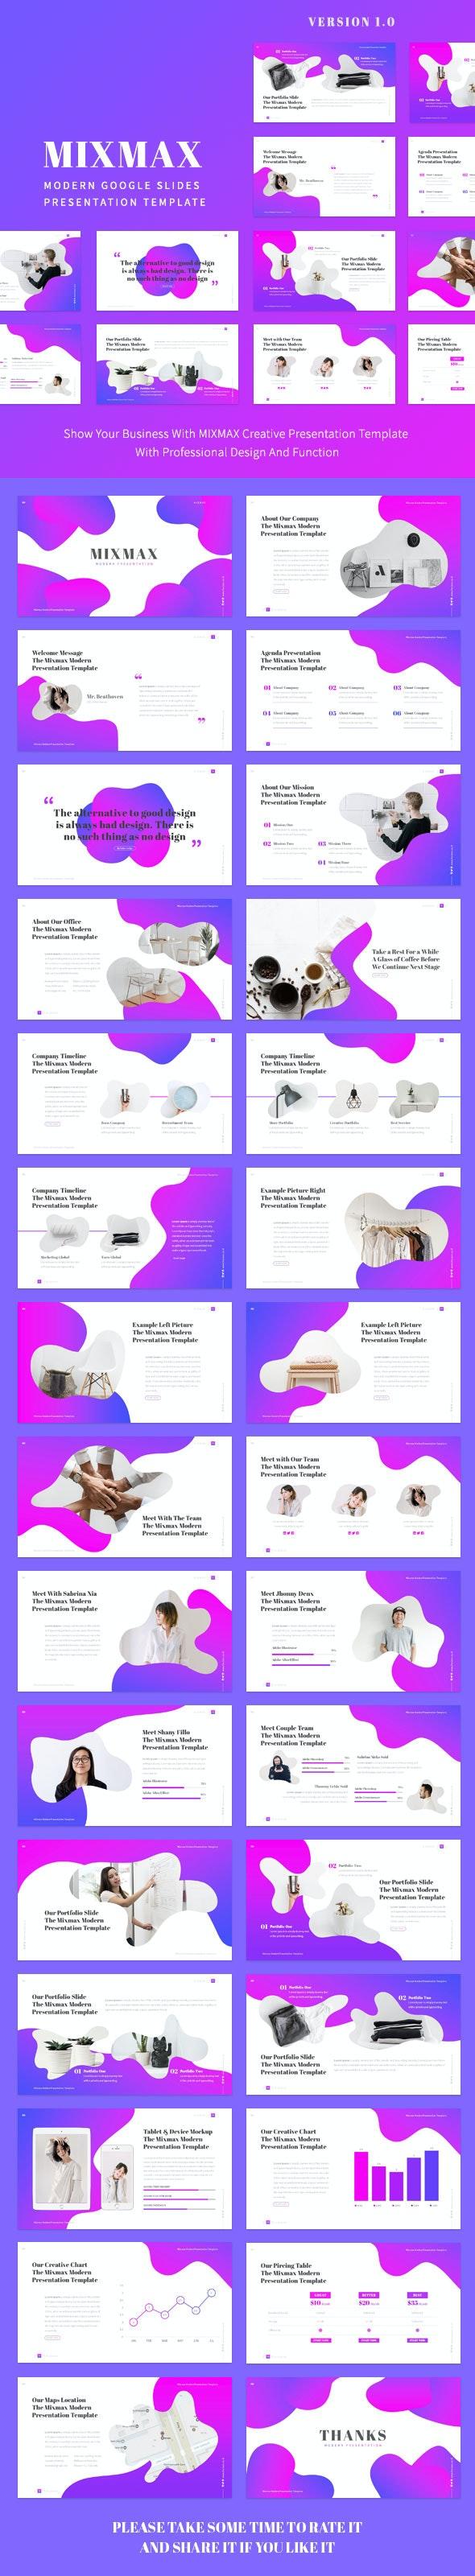 Mixmax - Modern Google Slides Presentation Template - Google Slides Presentation Templates